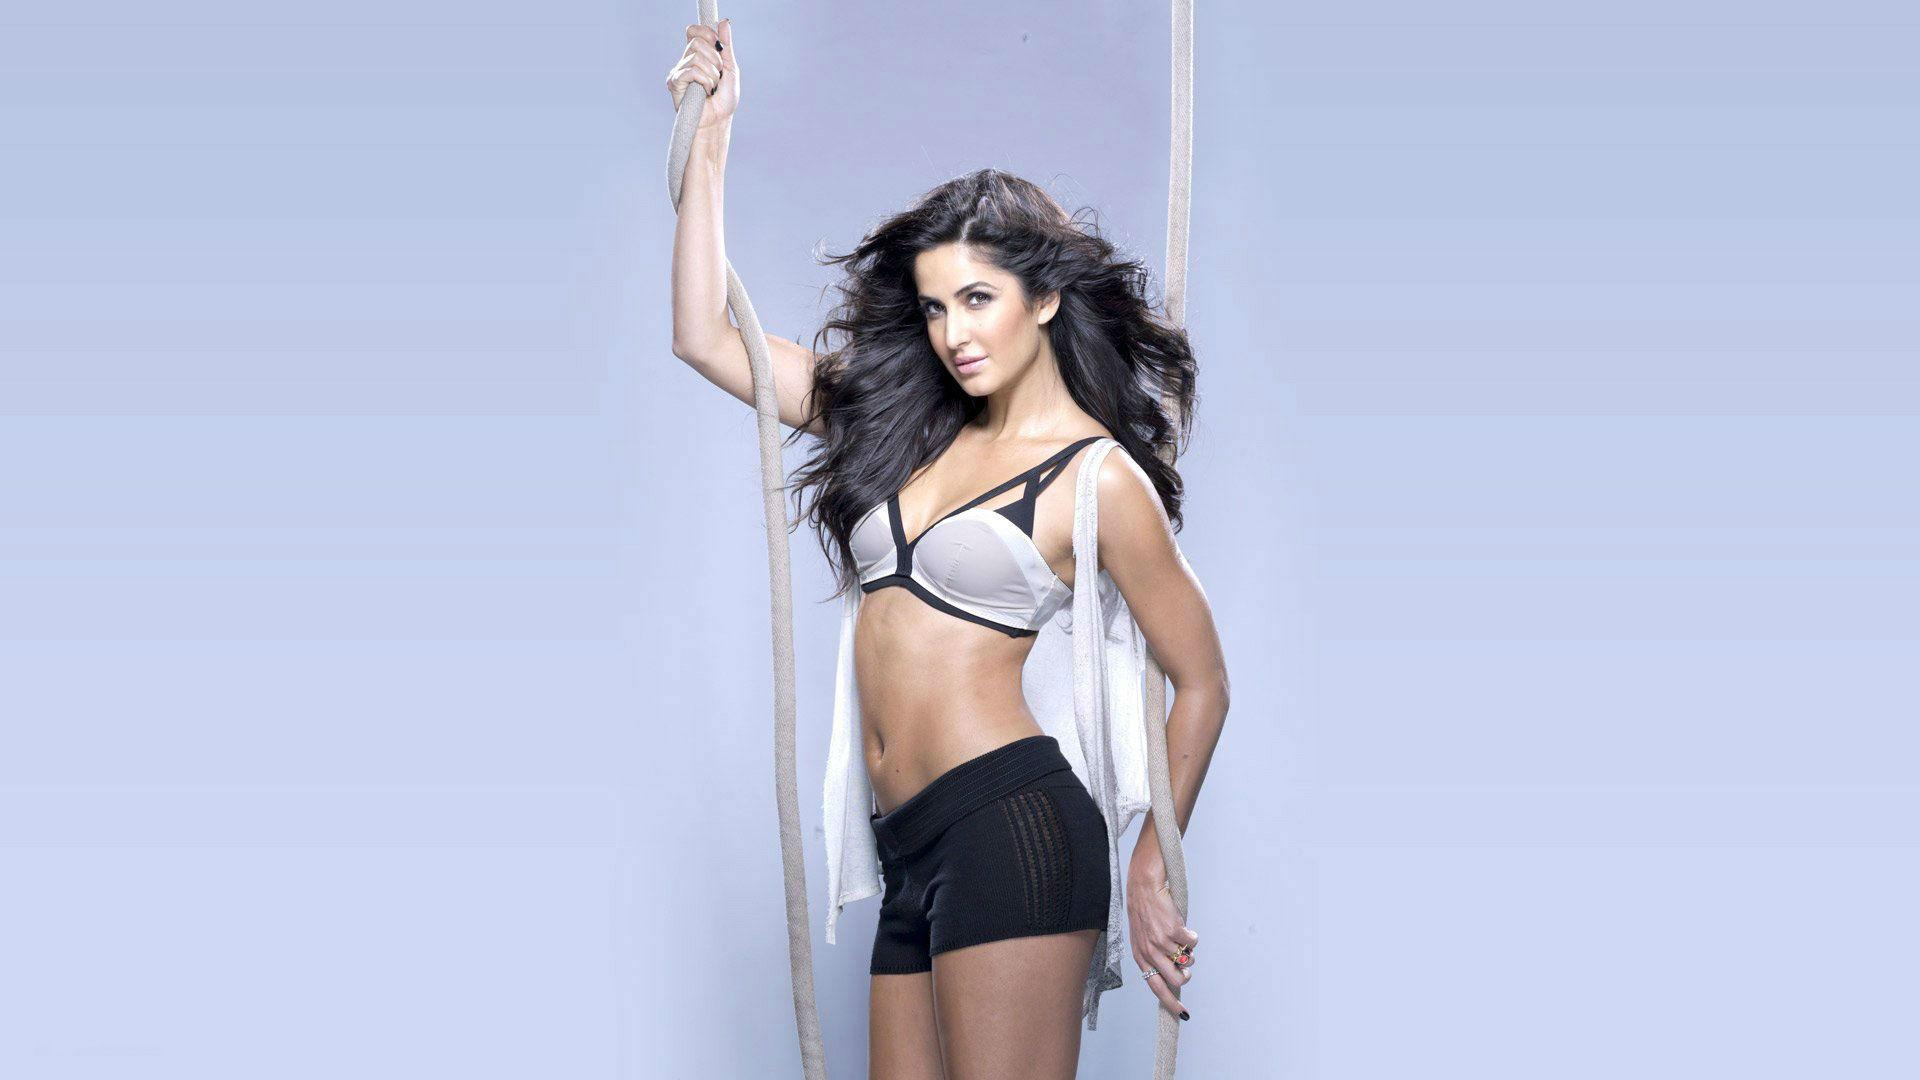 Katrina-Kaif-Hot-Bikini-Photos